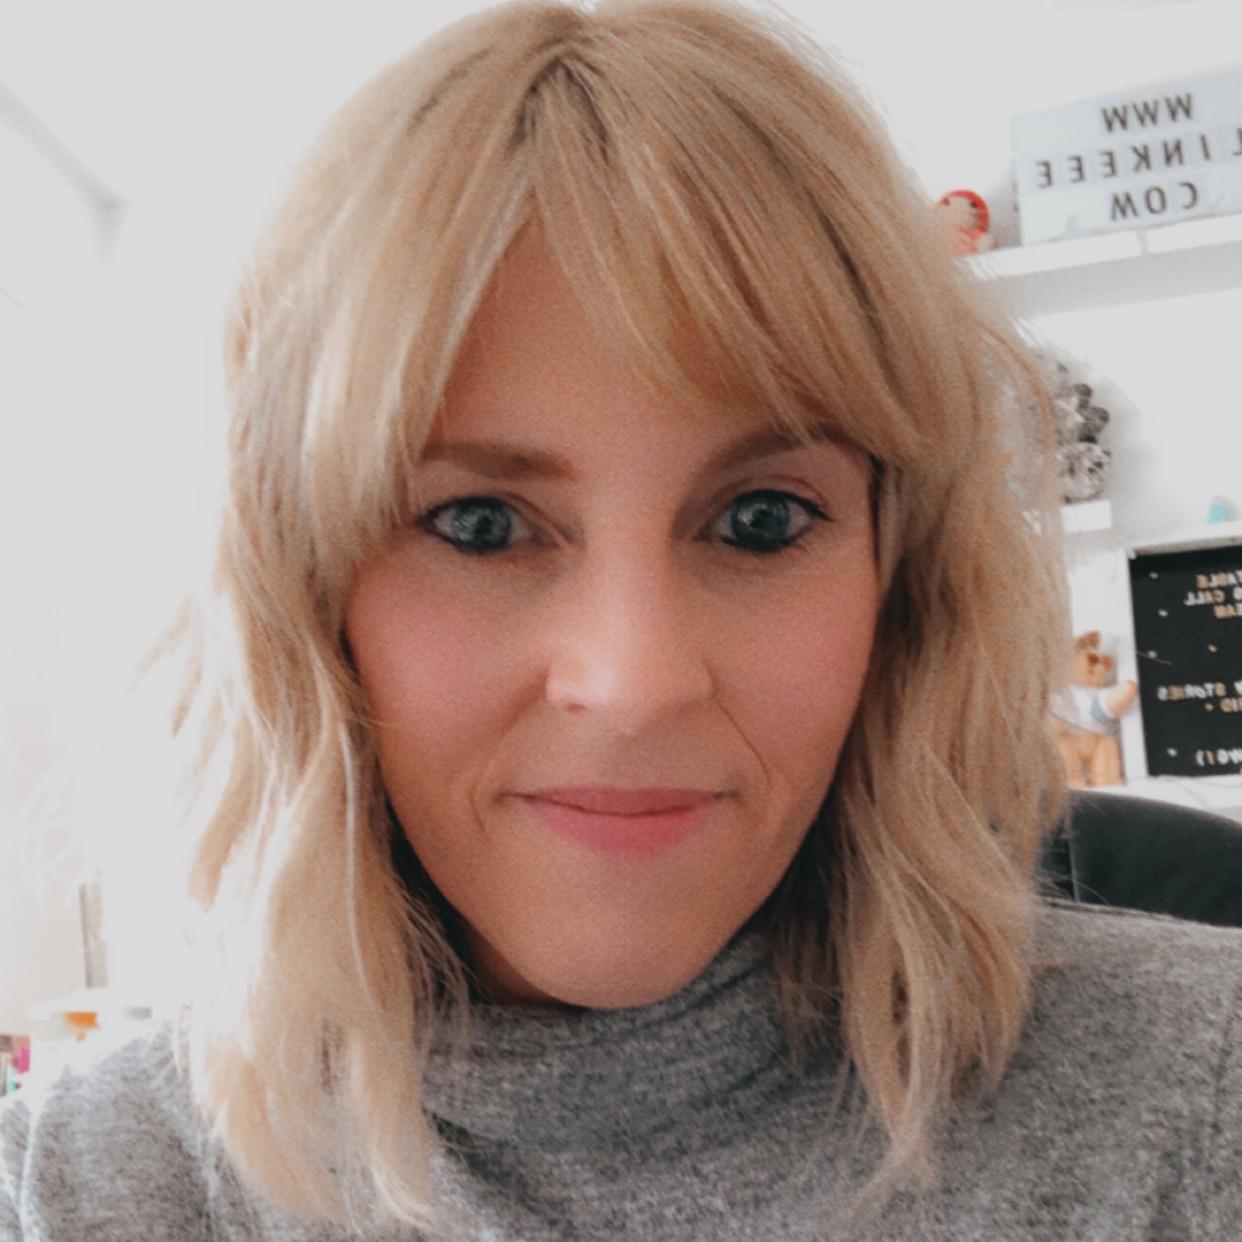 The owner of Slinkeee Illustration - Lindsay Elissa Coils